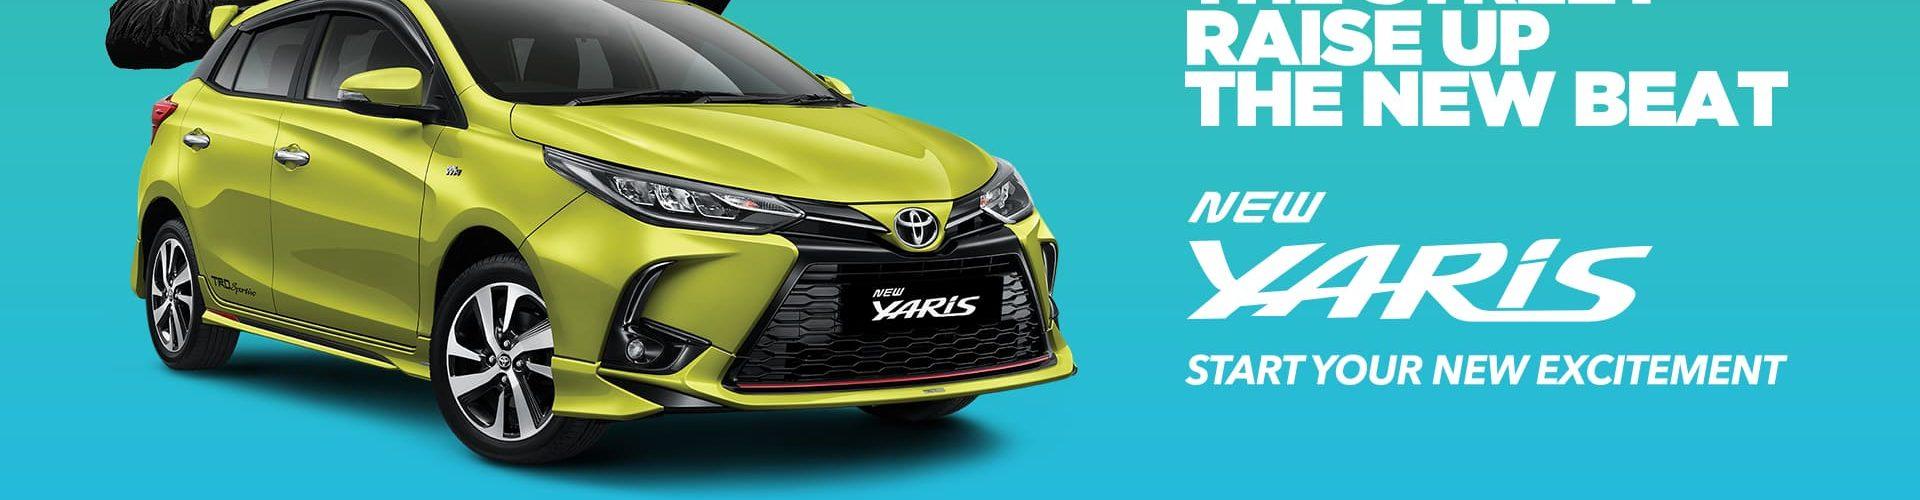 Dealer Toyota Malang Resmi Kartika Sari Yaris